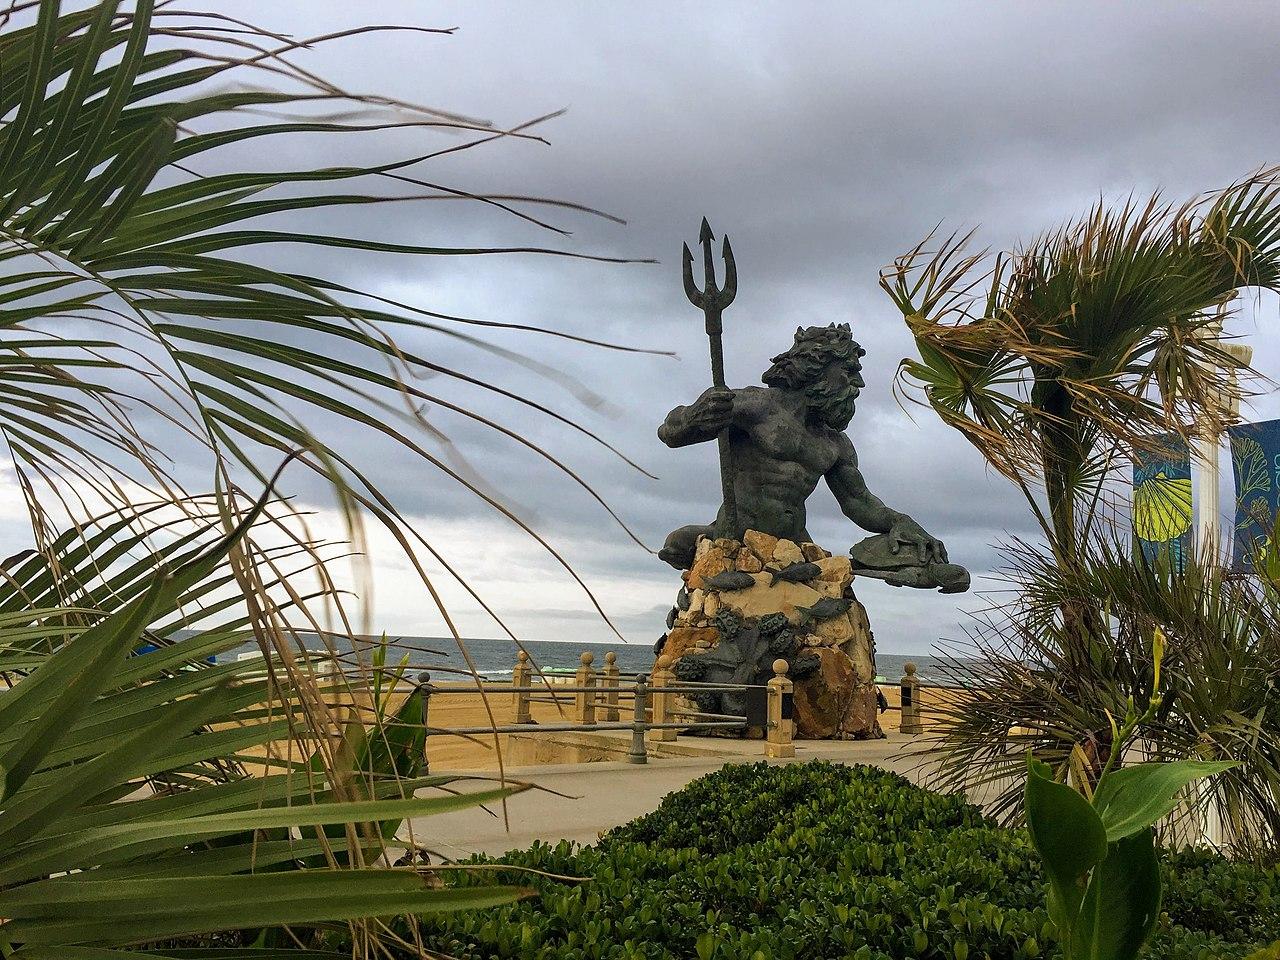 File:King Neptune, Virginia Beach.jpg - Wikimedia Commons